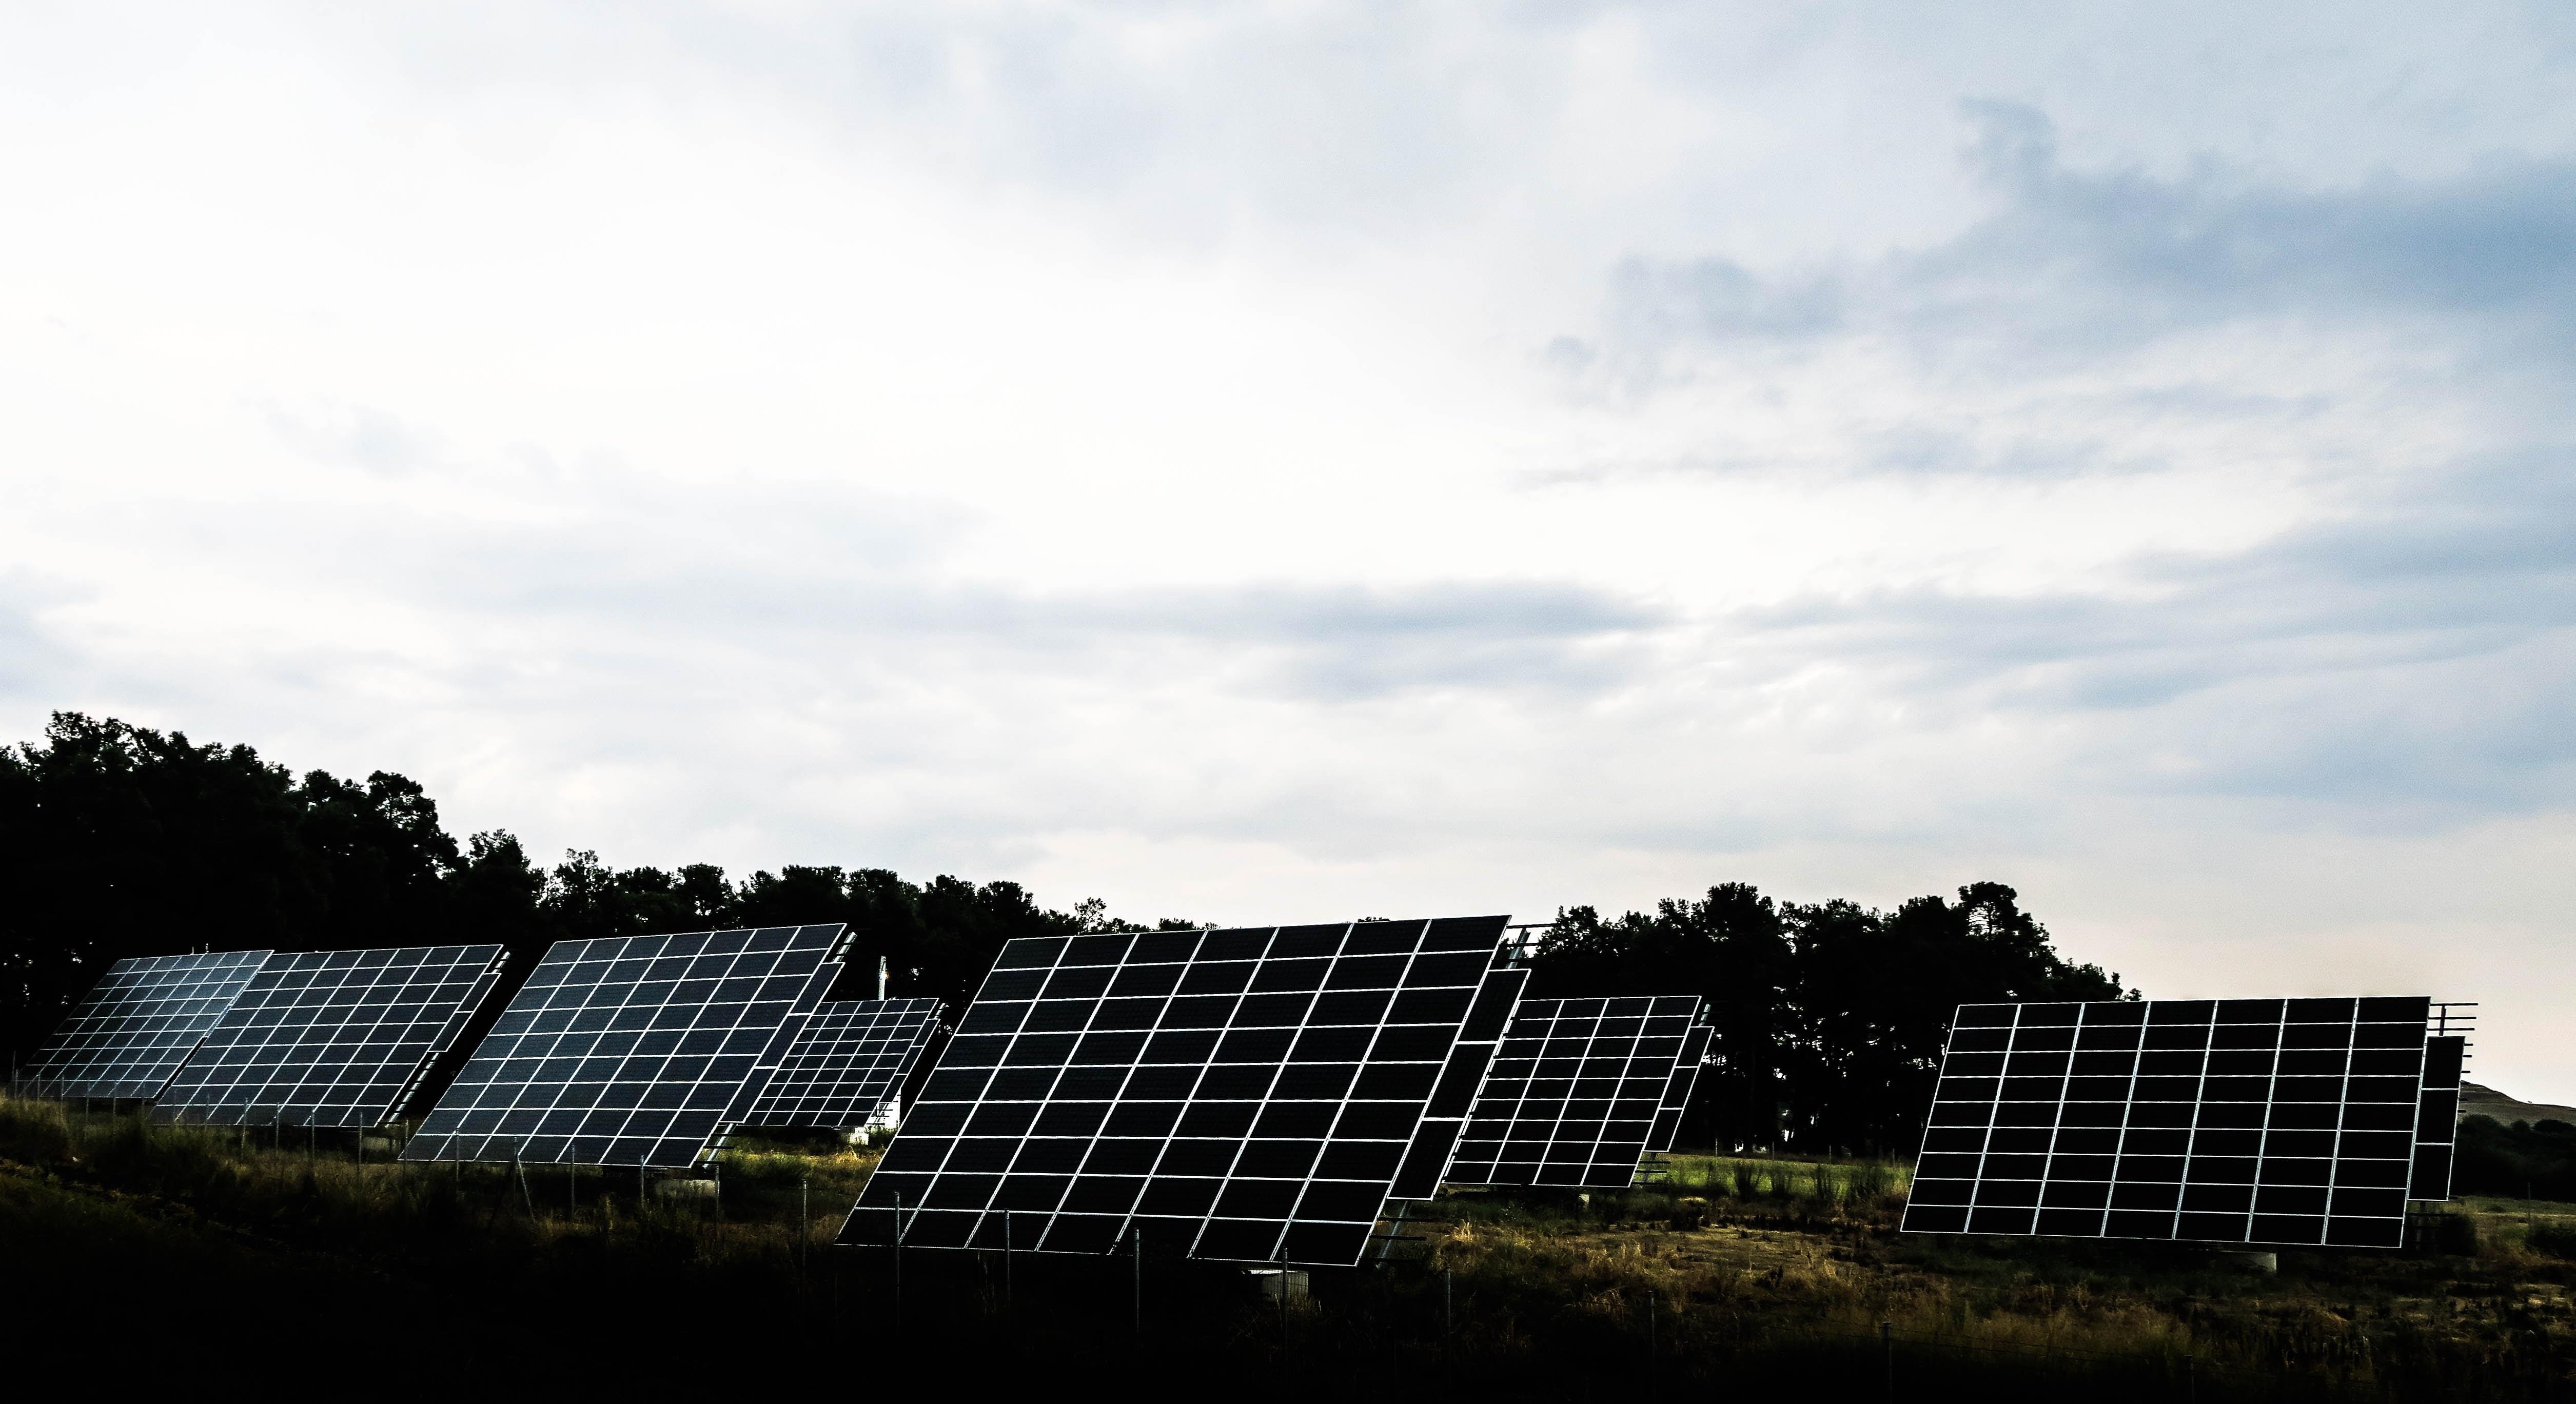 Energia solar na Campanha - Elysia energia fotovoltaica Rio Grande do Sul